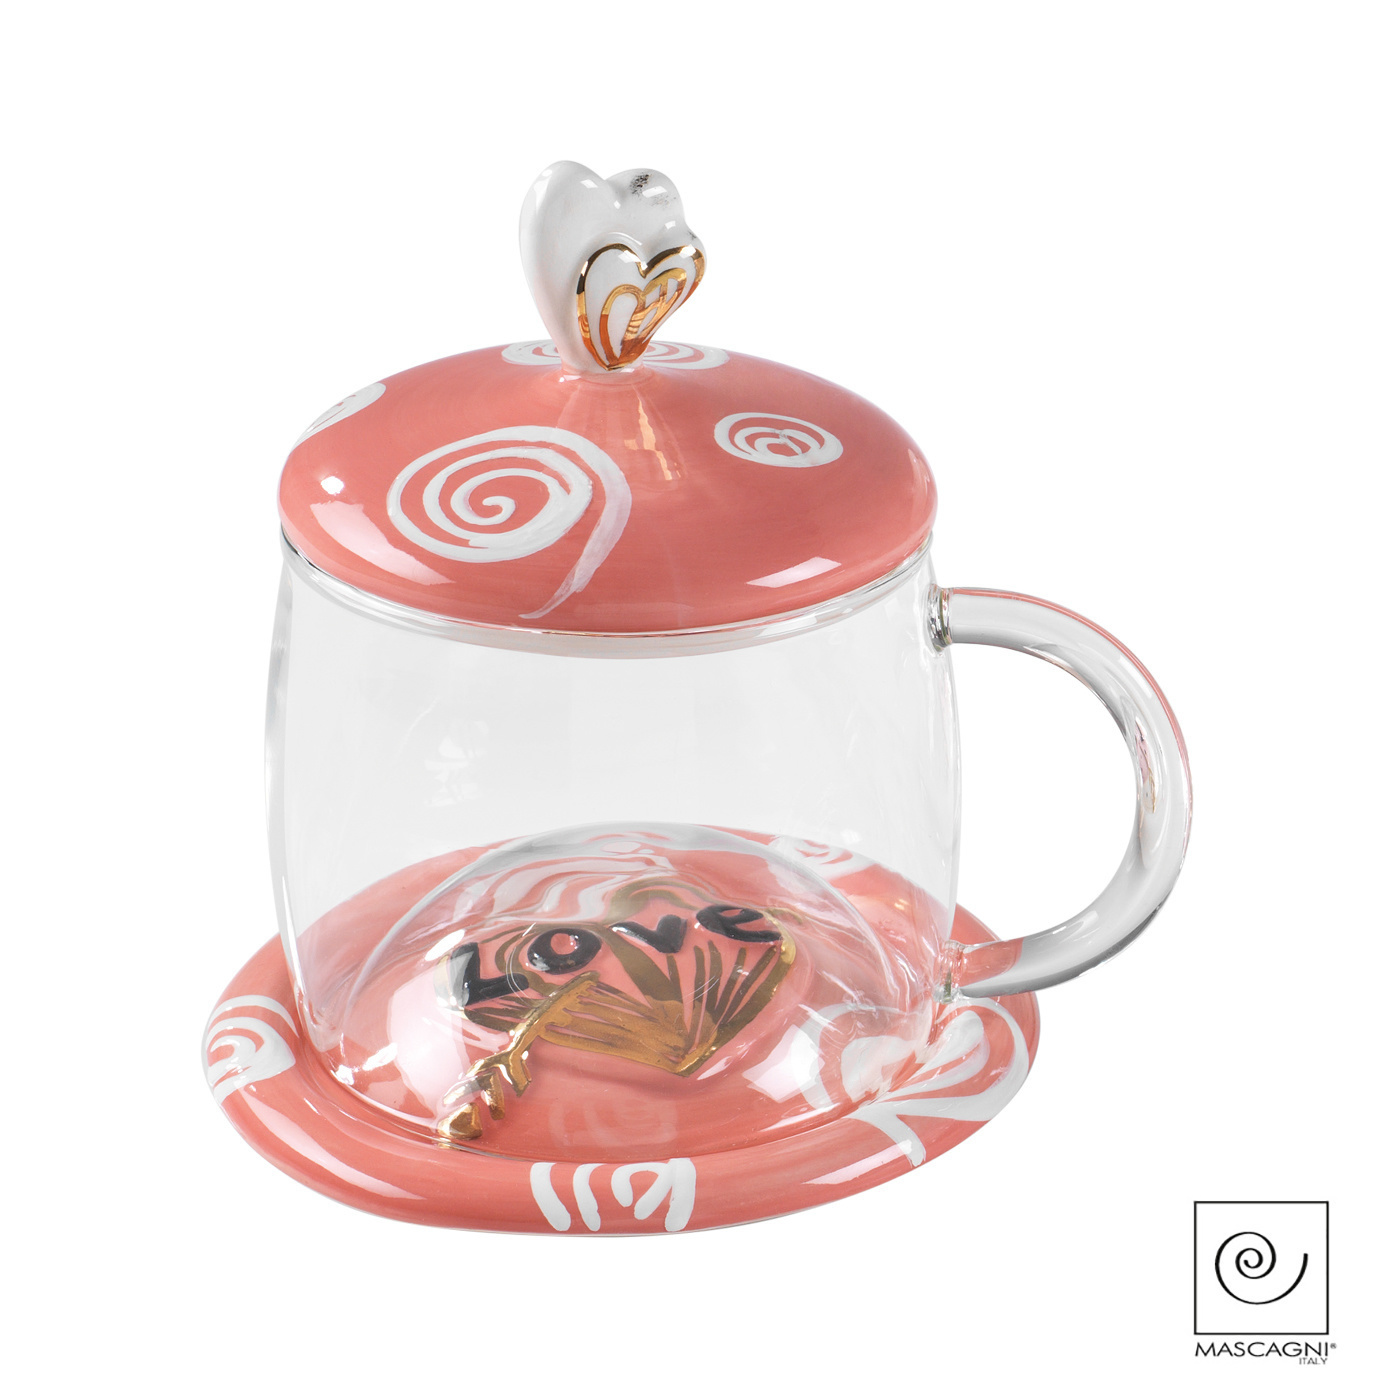 Art Mascagni A1024 TEA SET